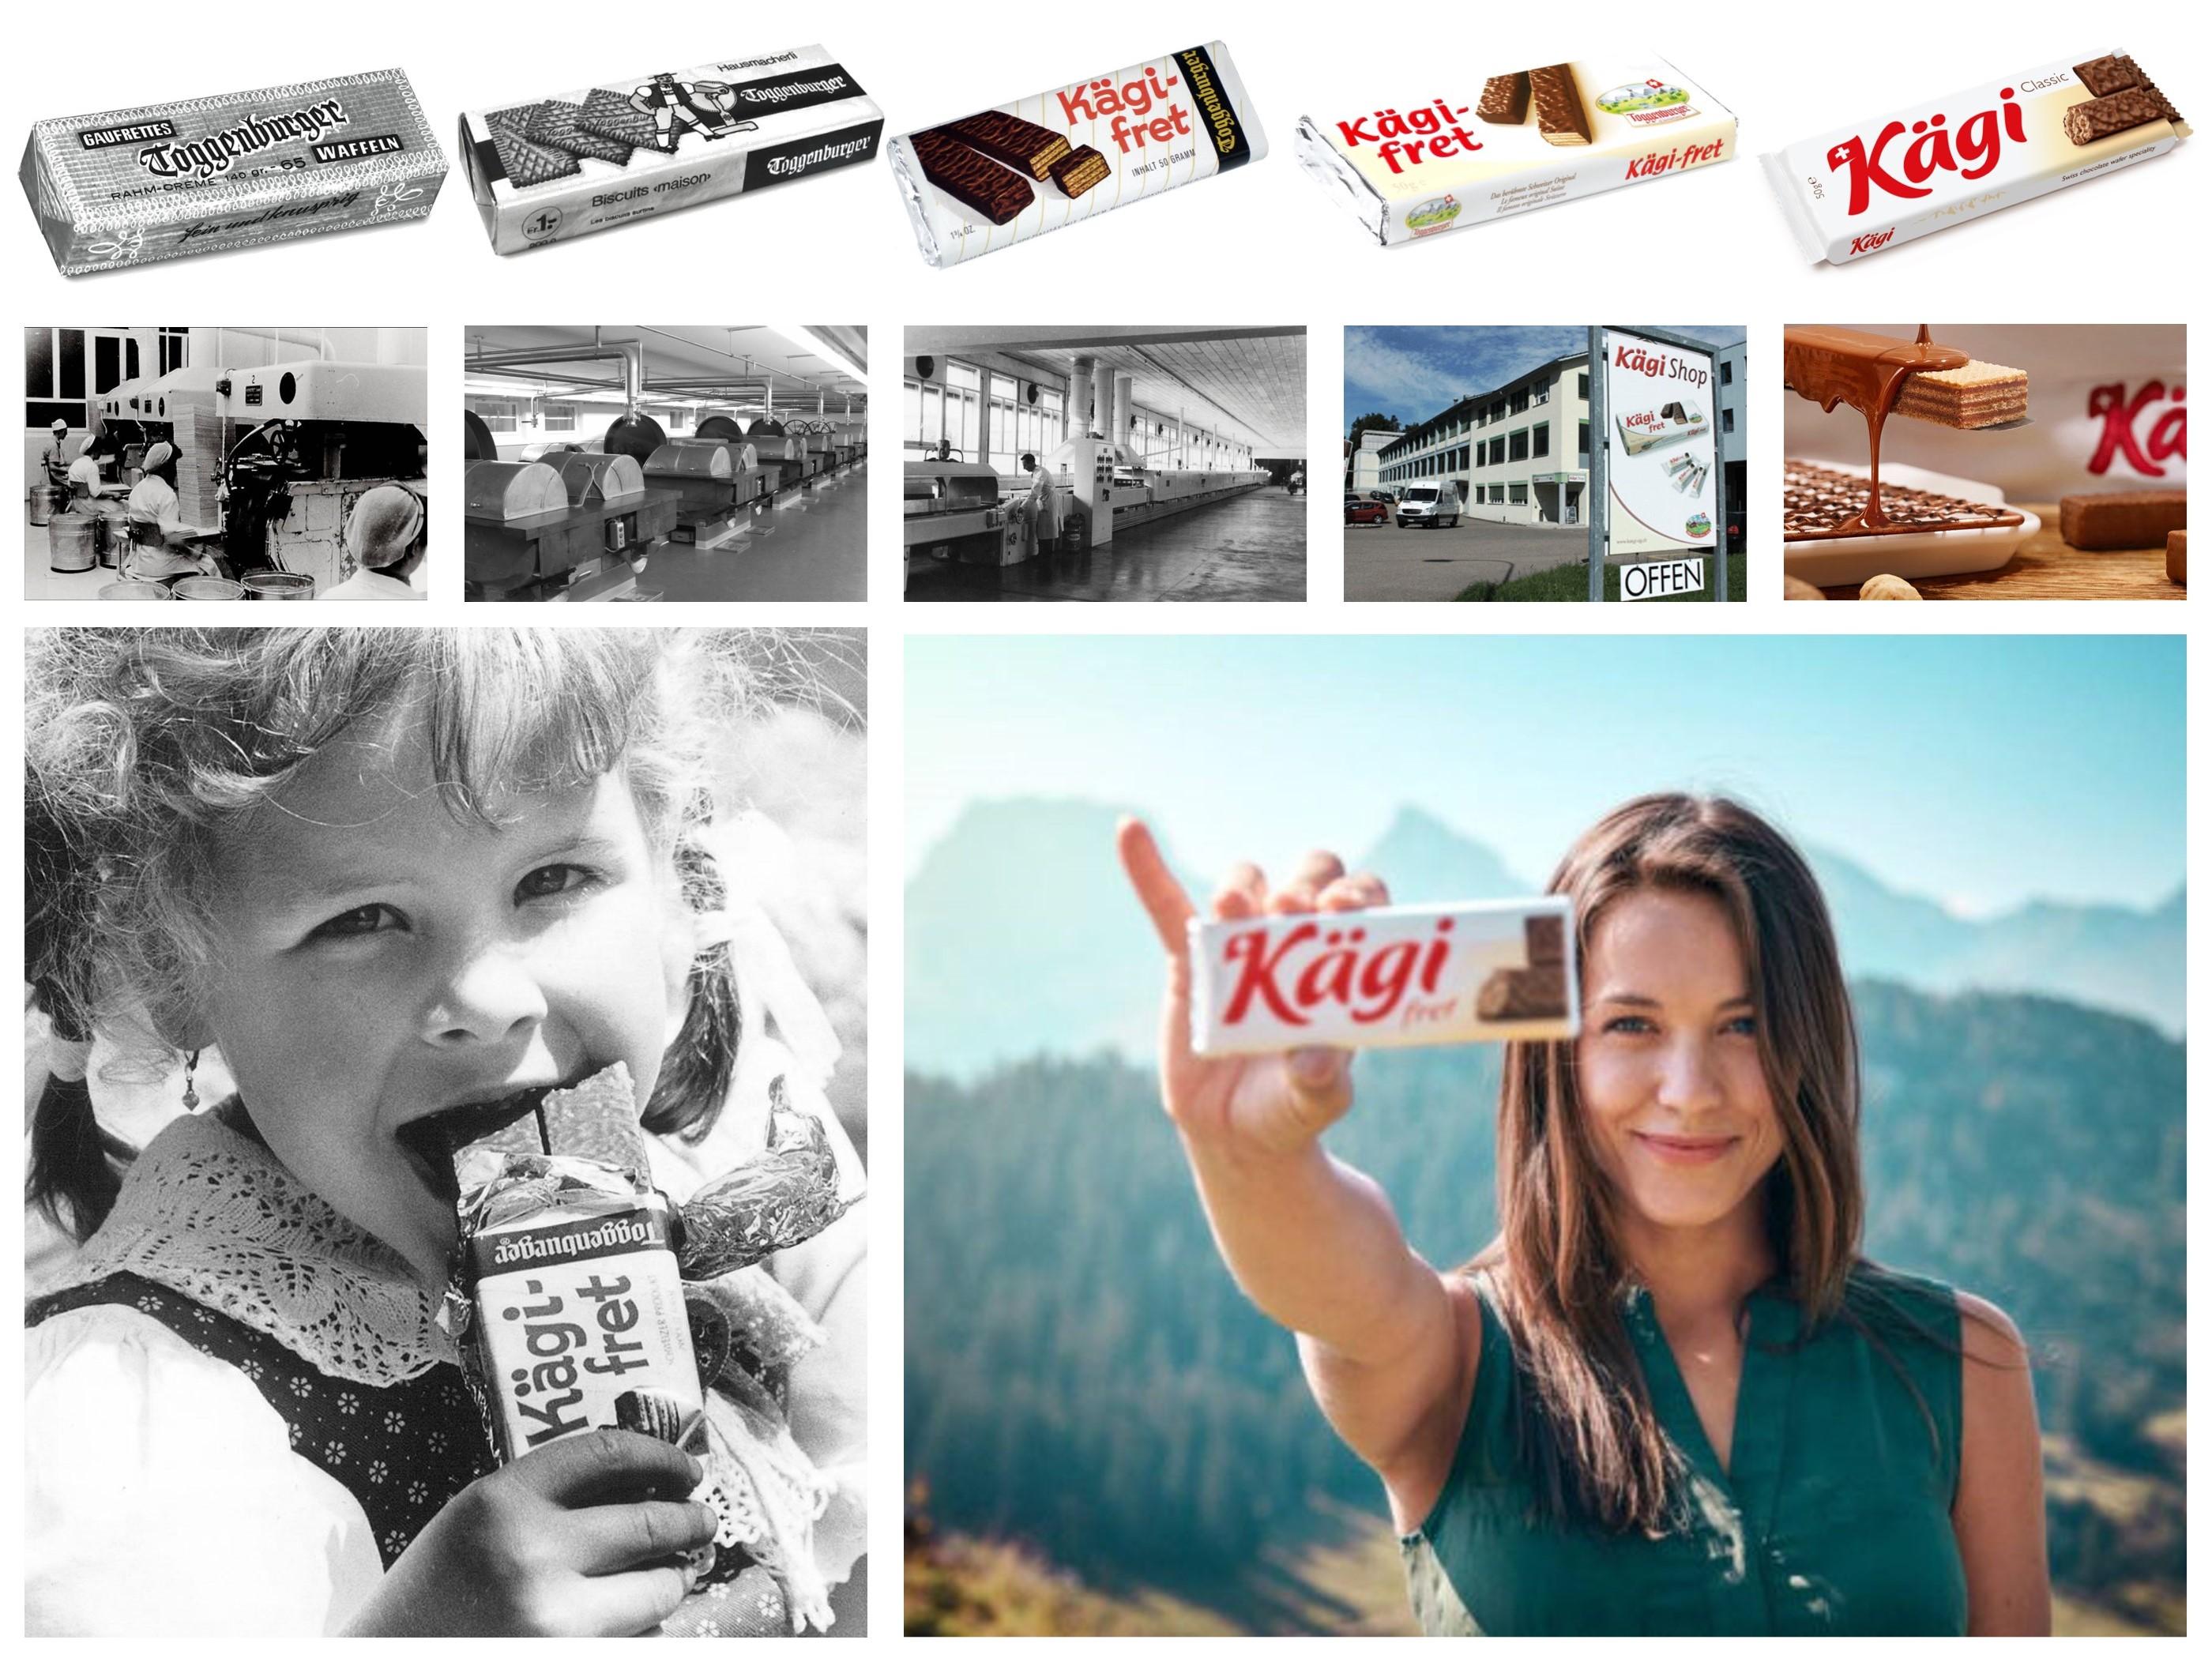 kaegi-collage-history.jpg